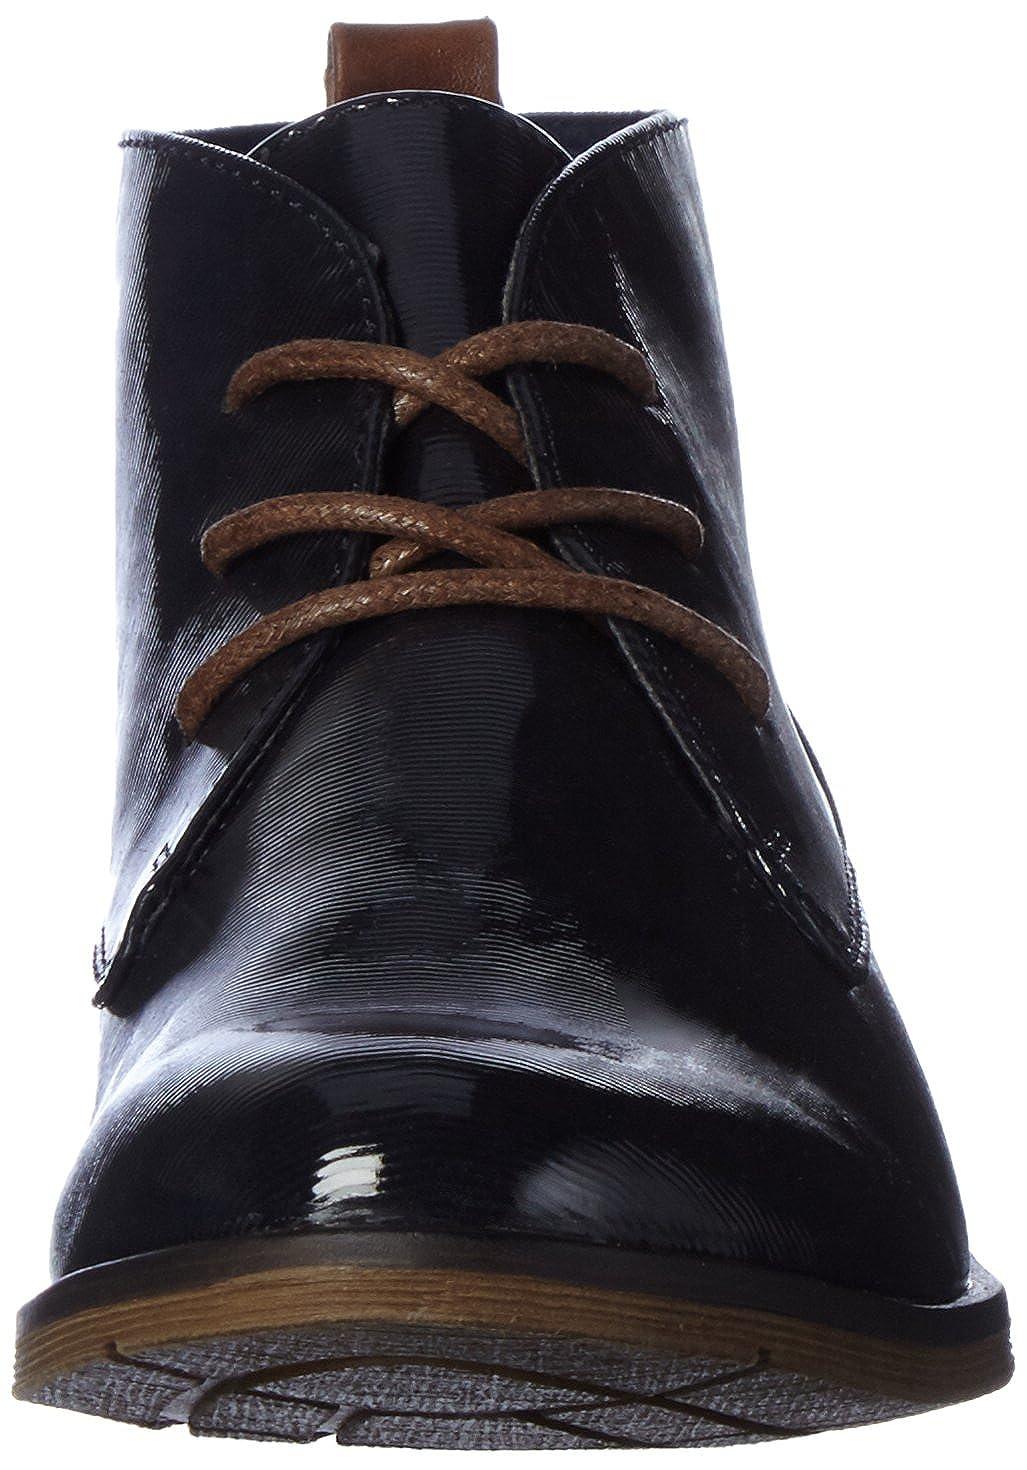 Femme Marco 25120 Tozzi Chaussures Sacs Chukka Et Bottes ArrIWqna